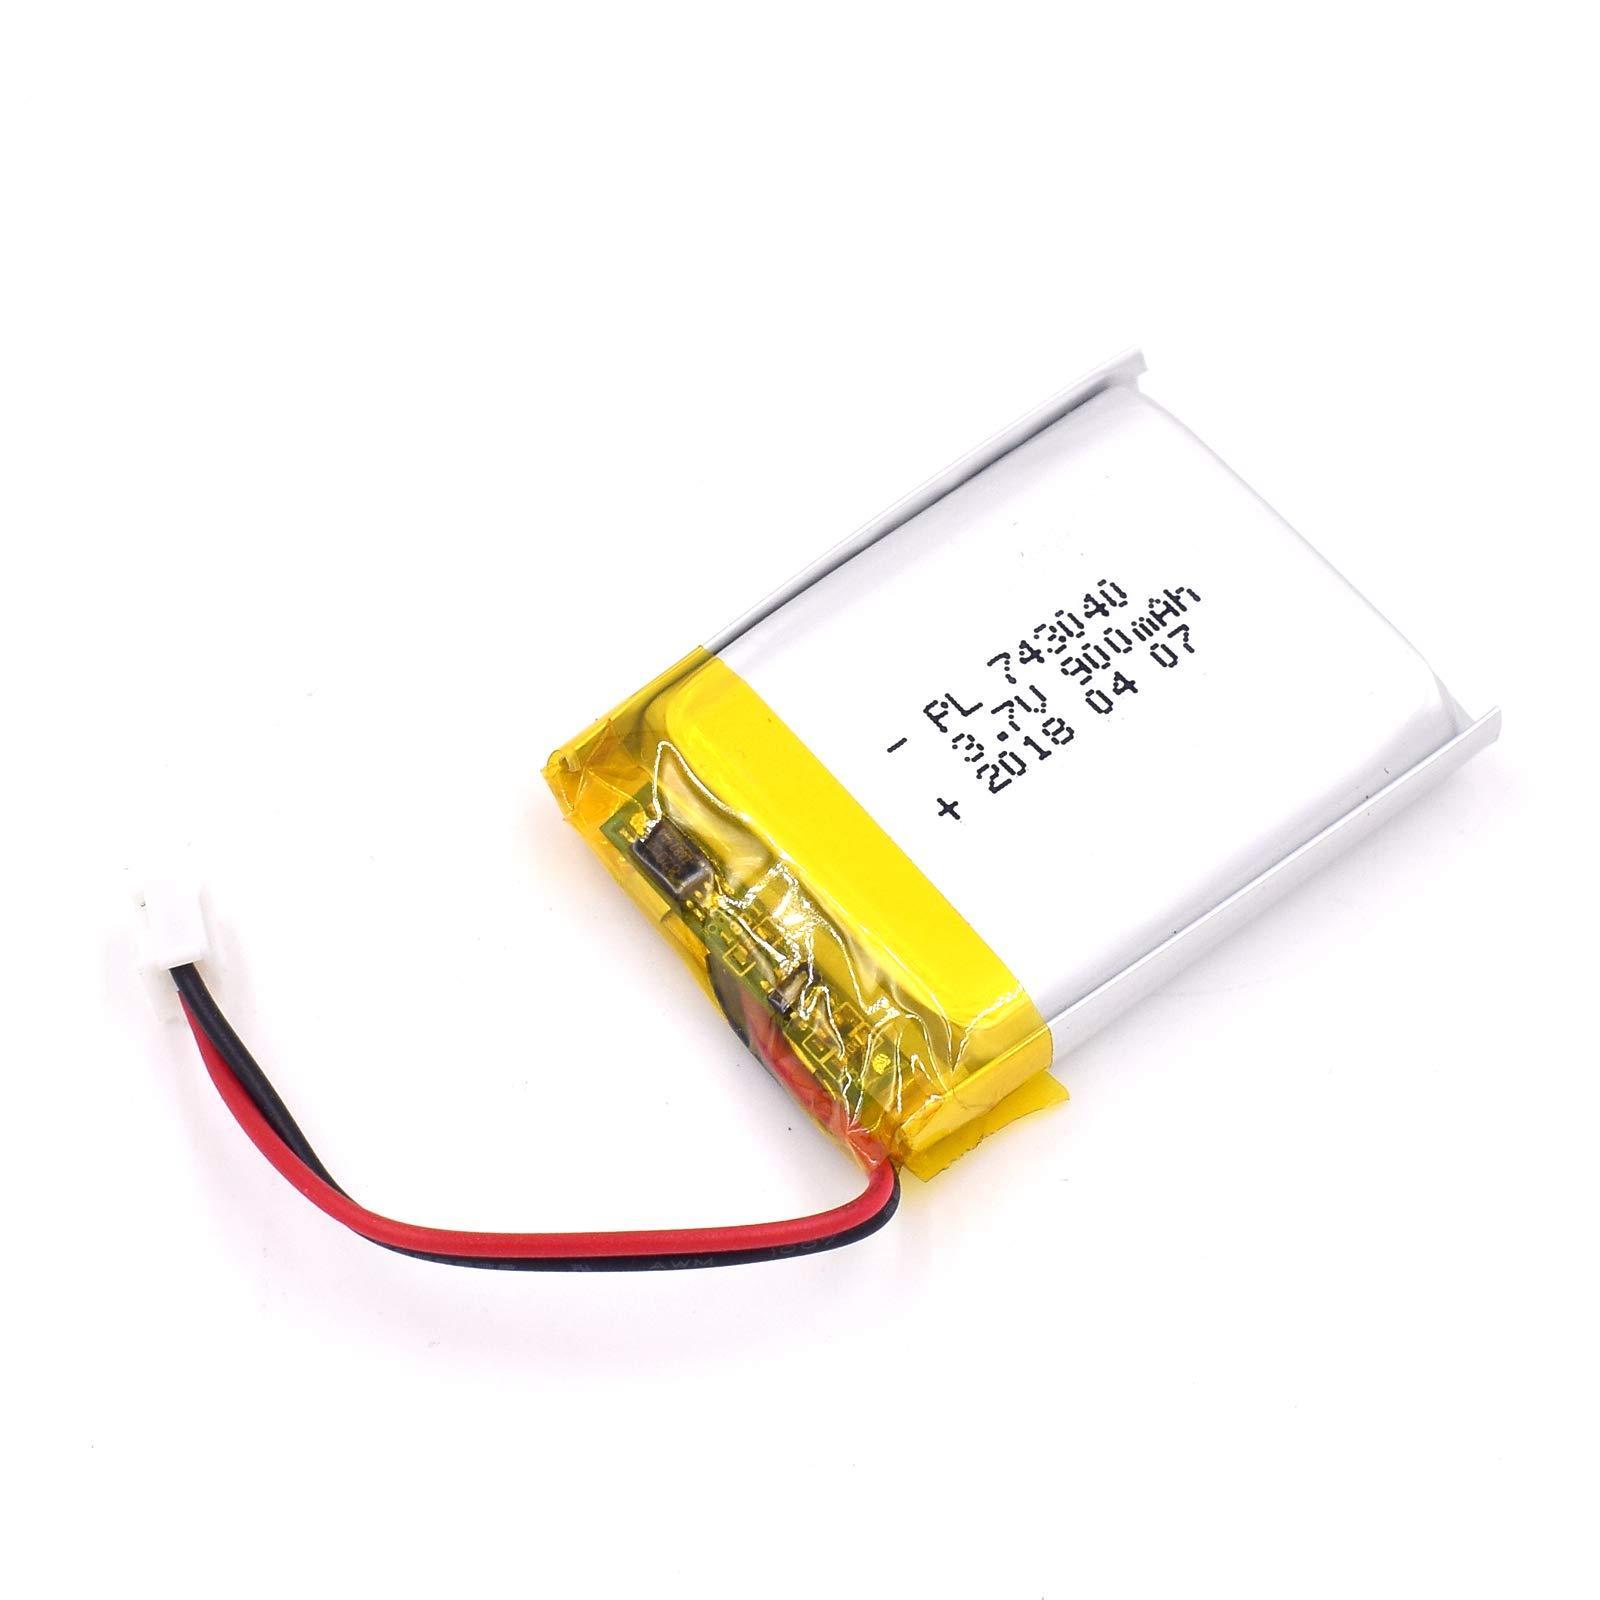 Bateria Lipo 3.7V 900mAh 743040 Recargable JST Conector